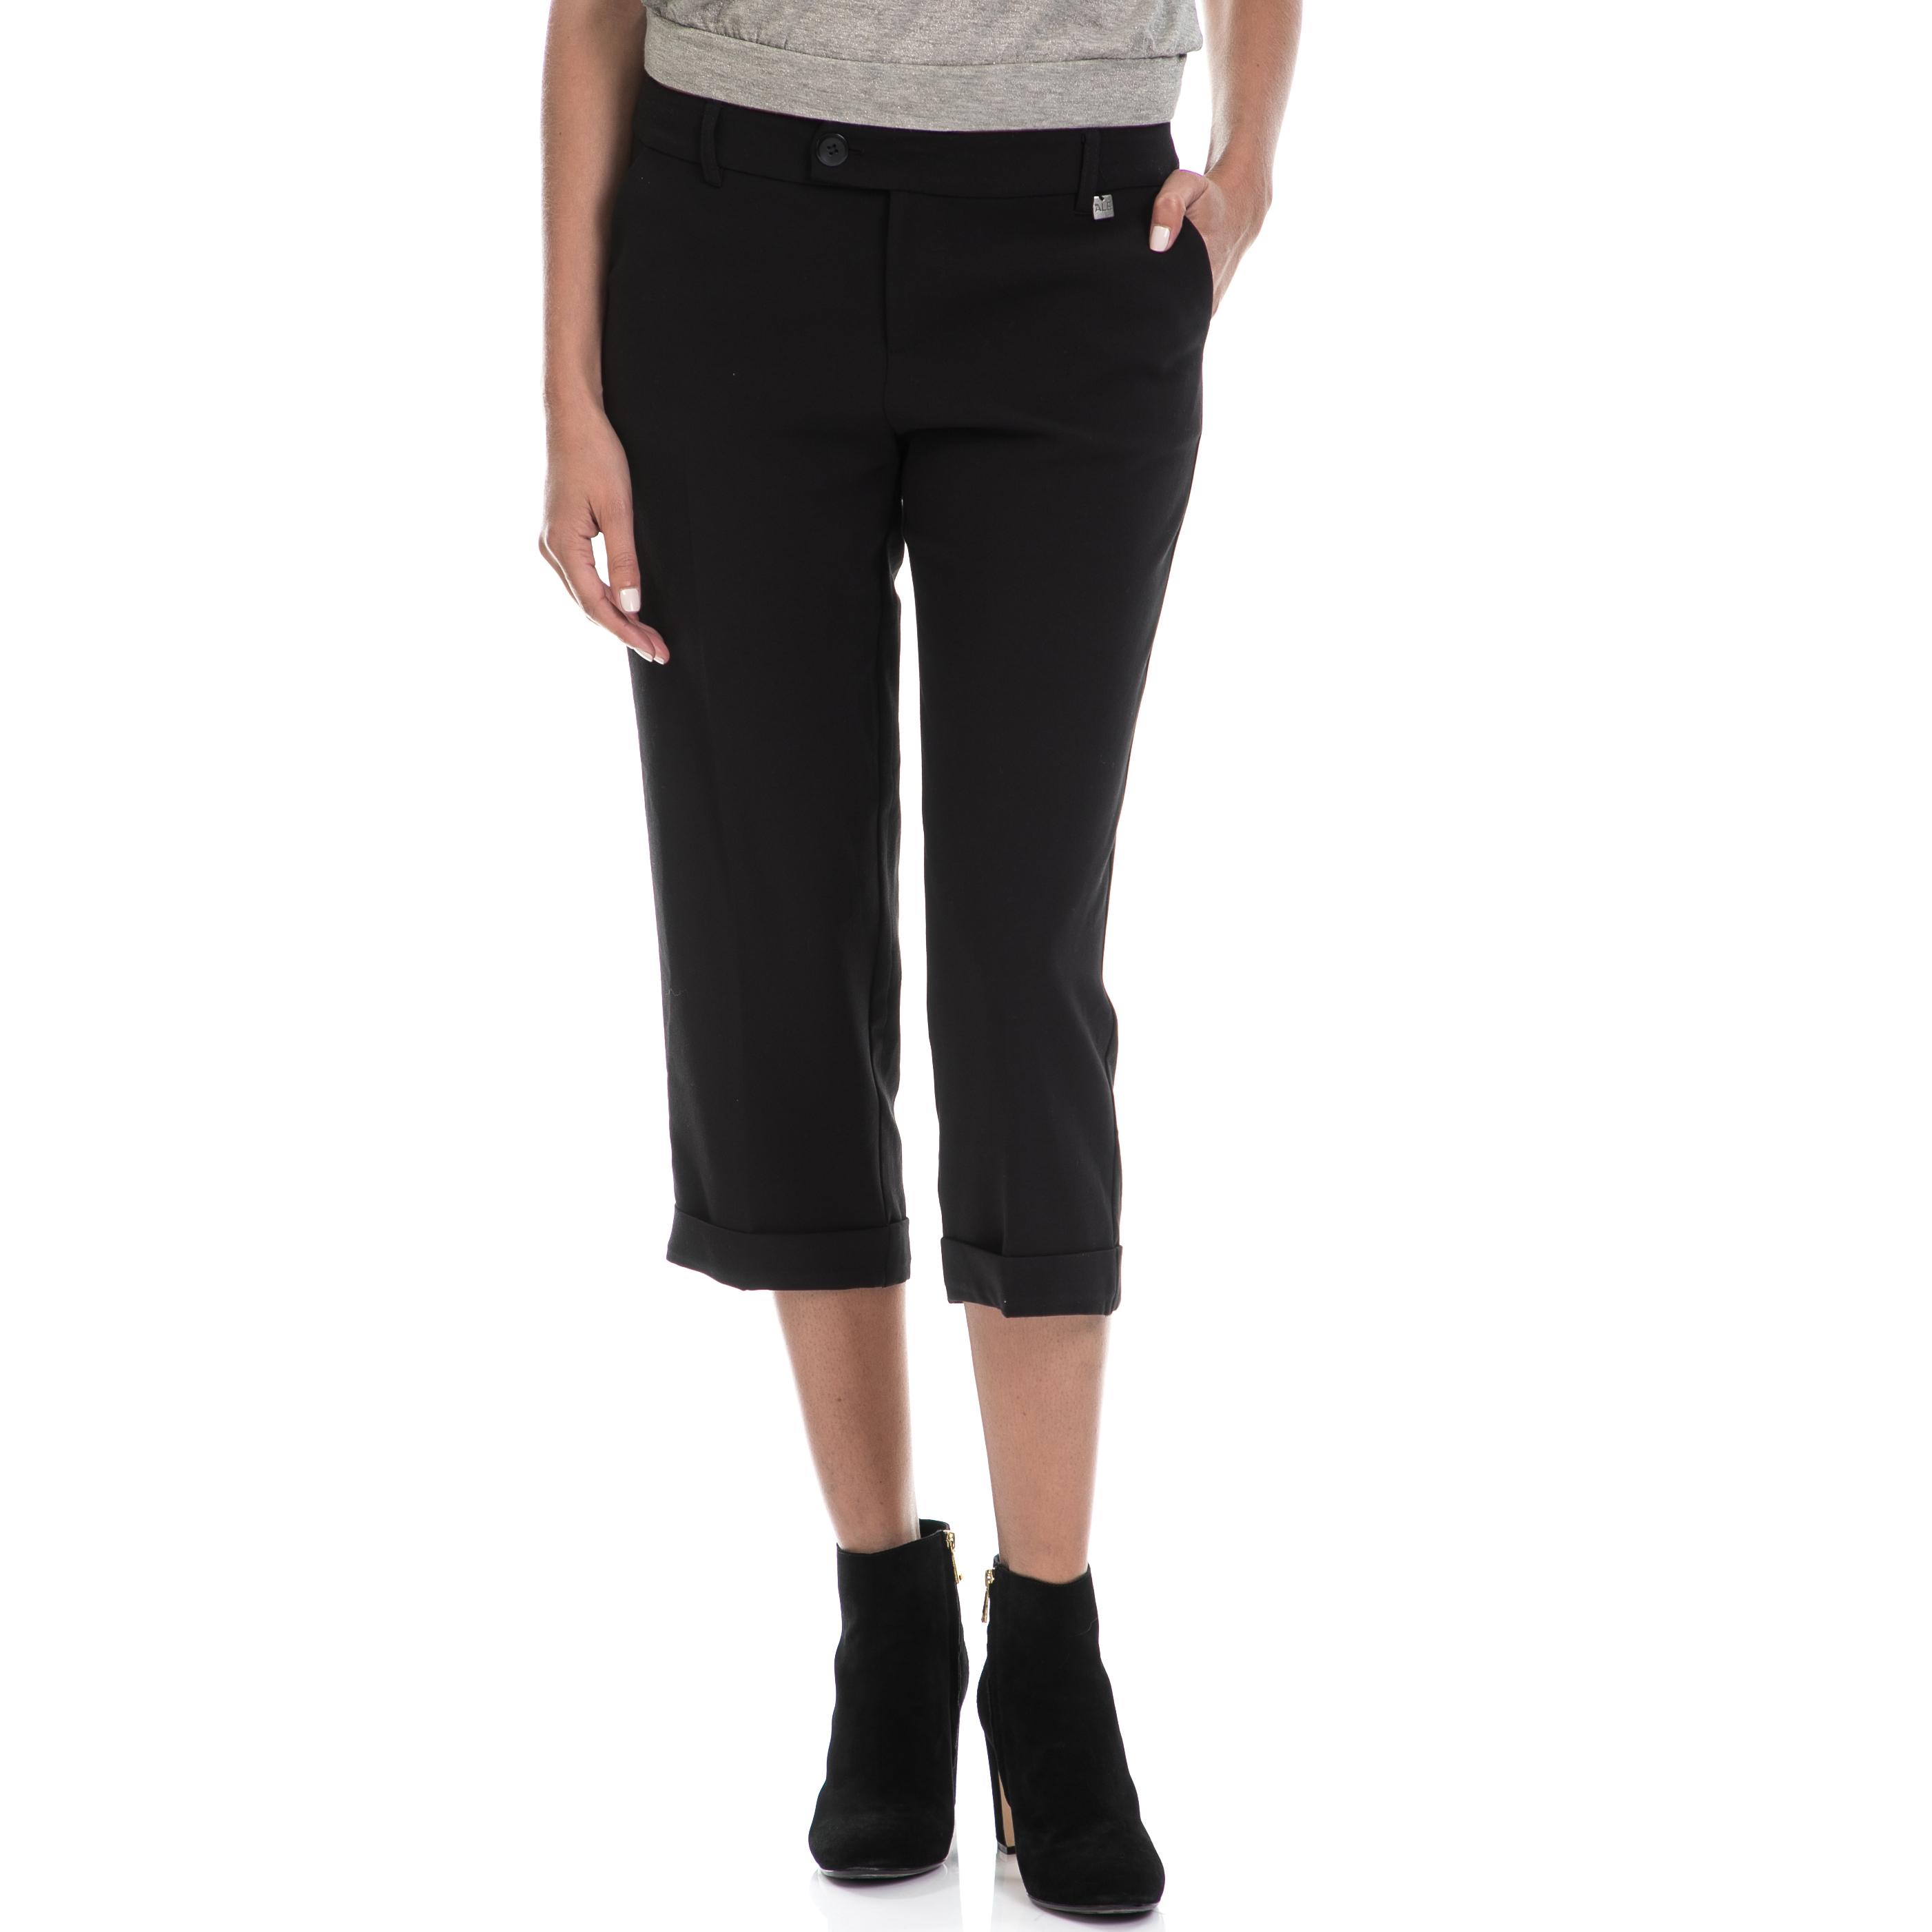 'ALE – Γυναικείο παντελόνι 'ALE μαύρο